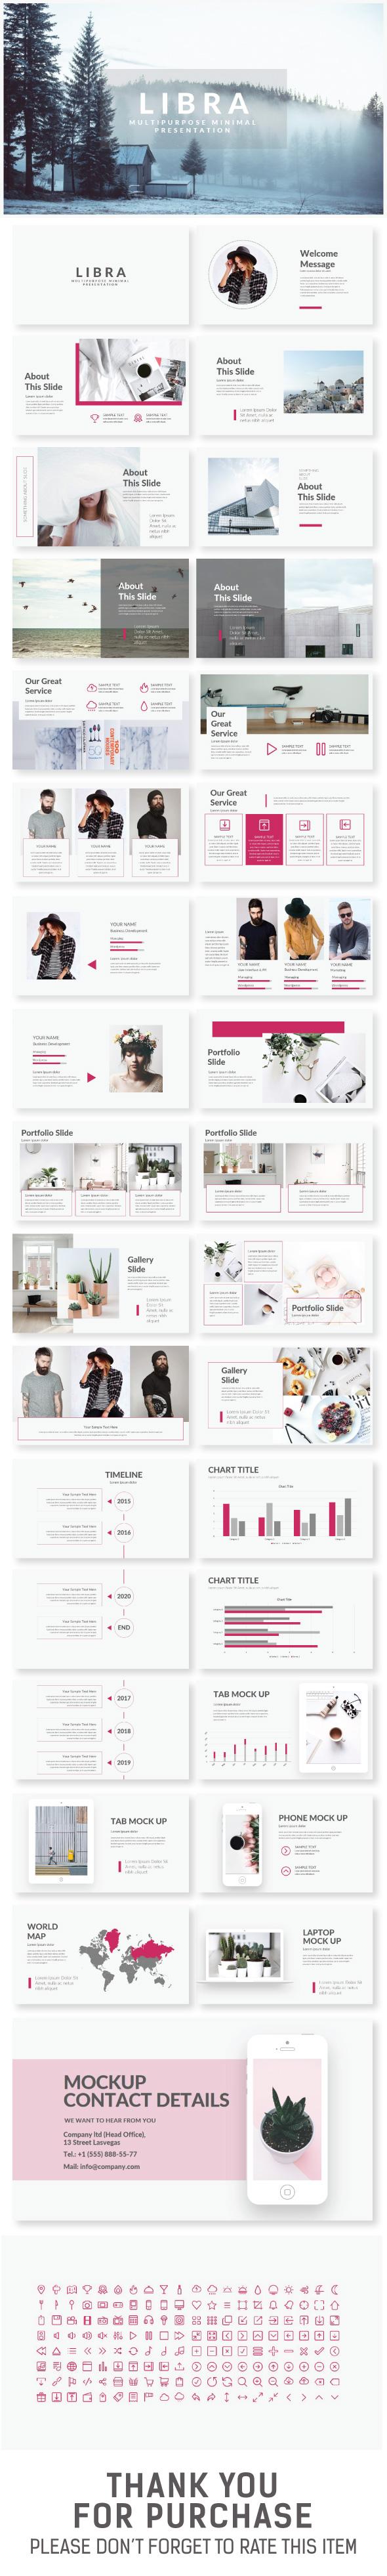 Libra Presentation Template - Creative PowerPoint Templates